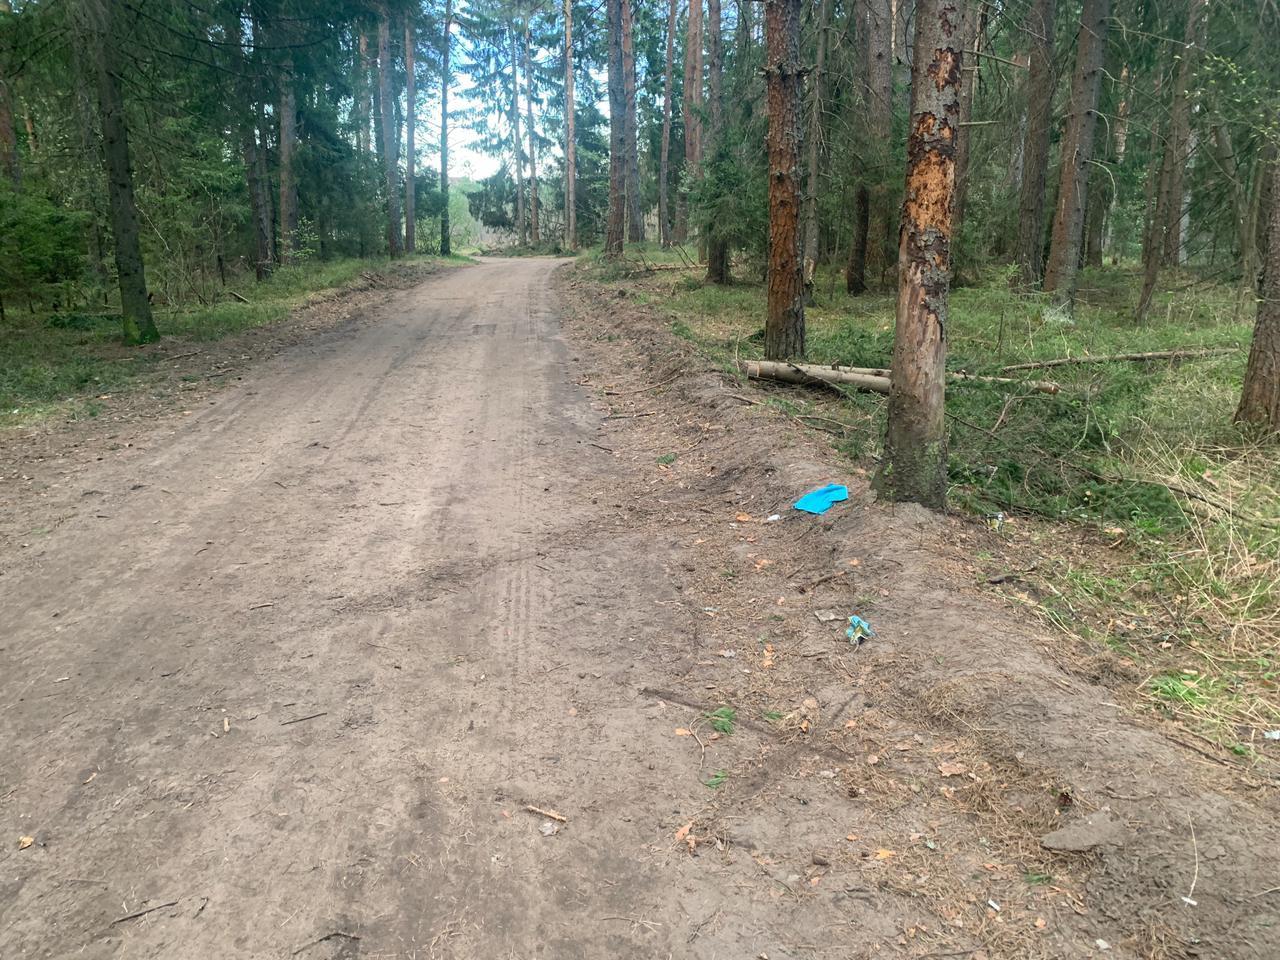 В Кимрах разыскивают владельца квадроцикла, на котором подросток сломал бедро